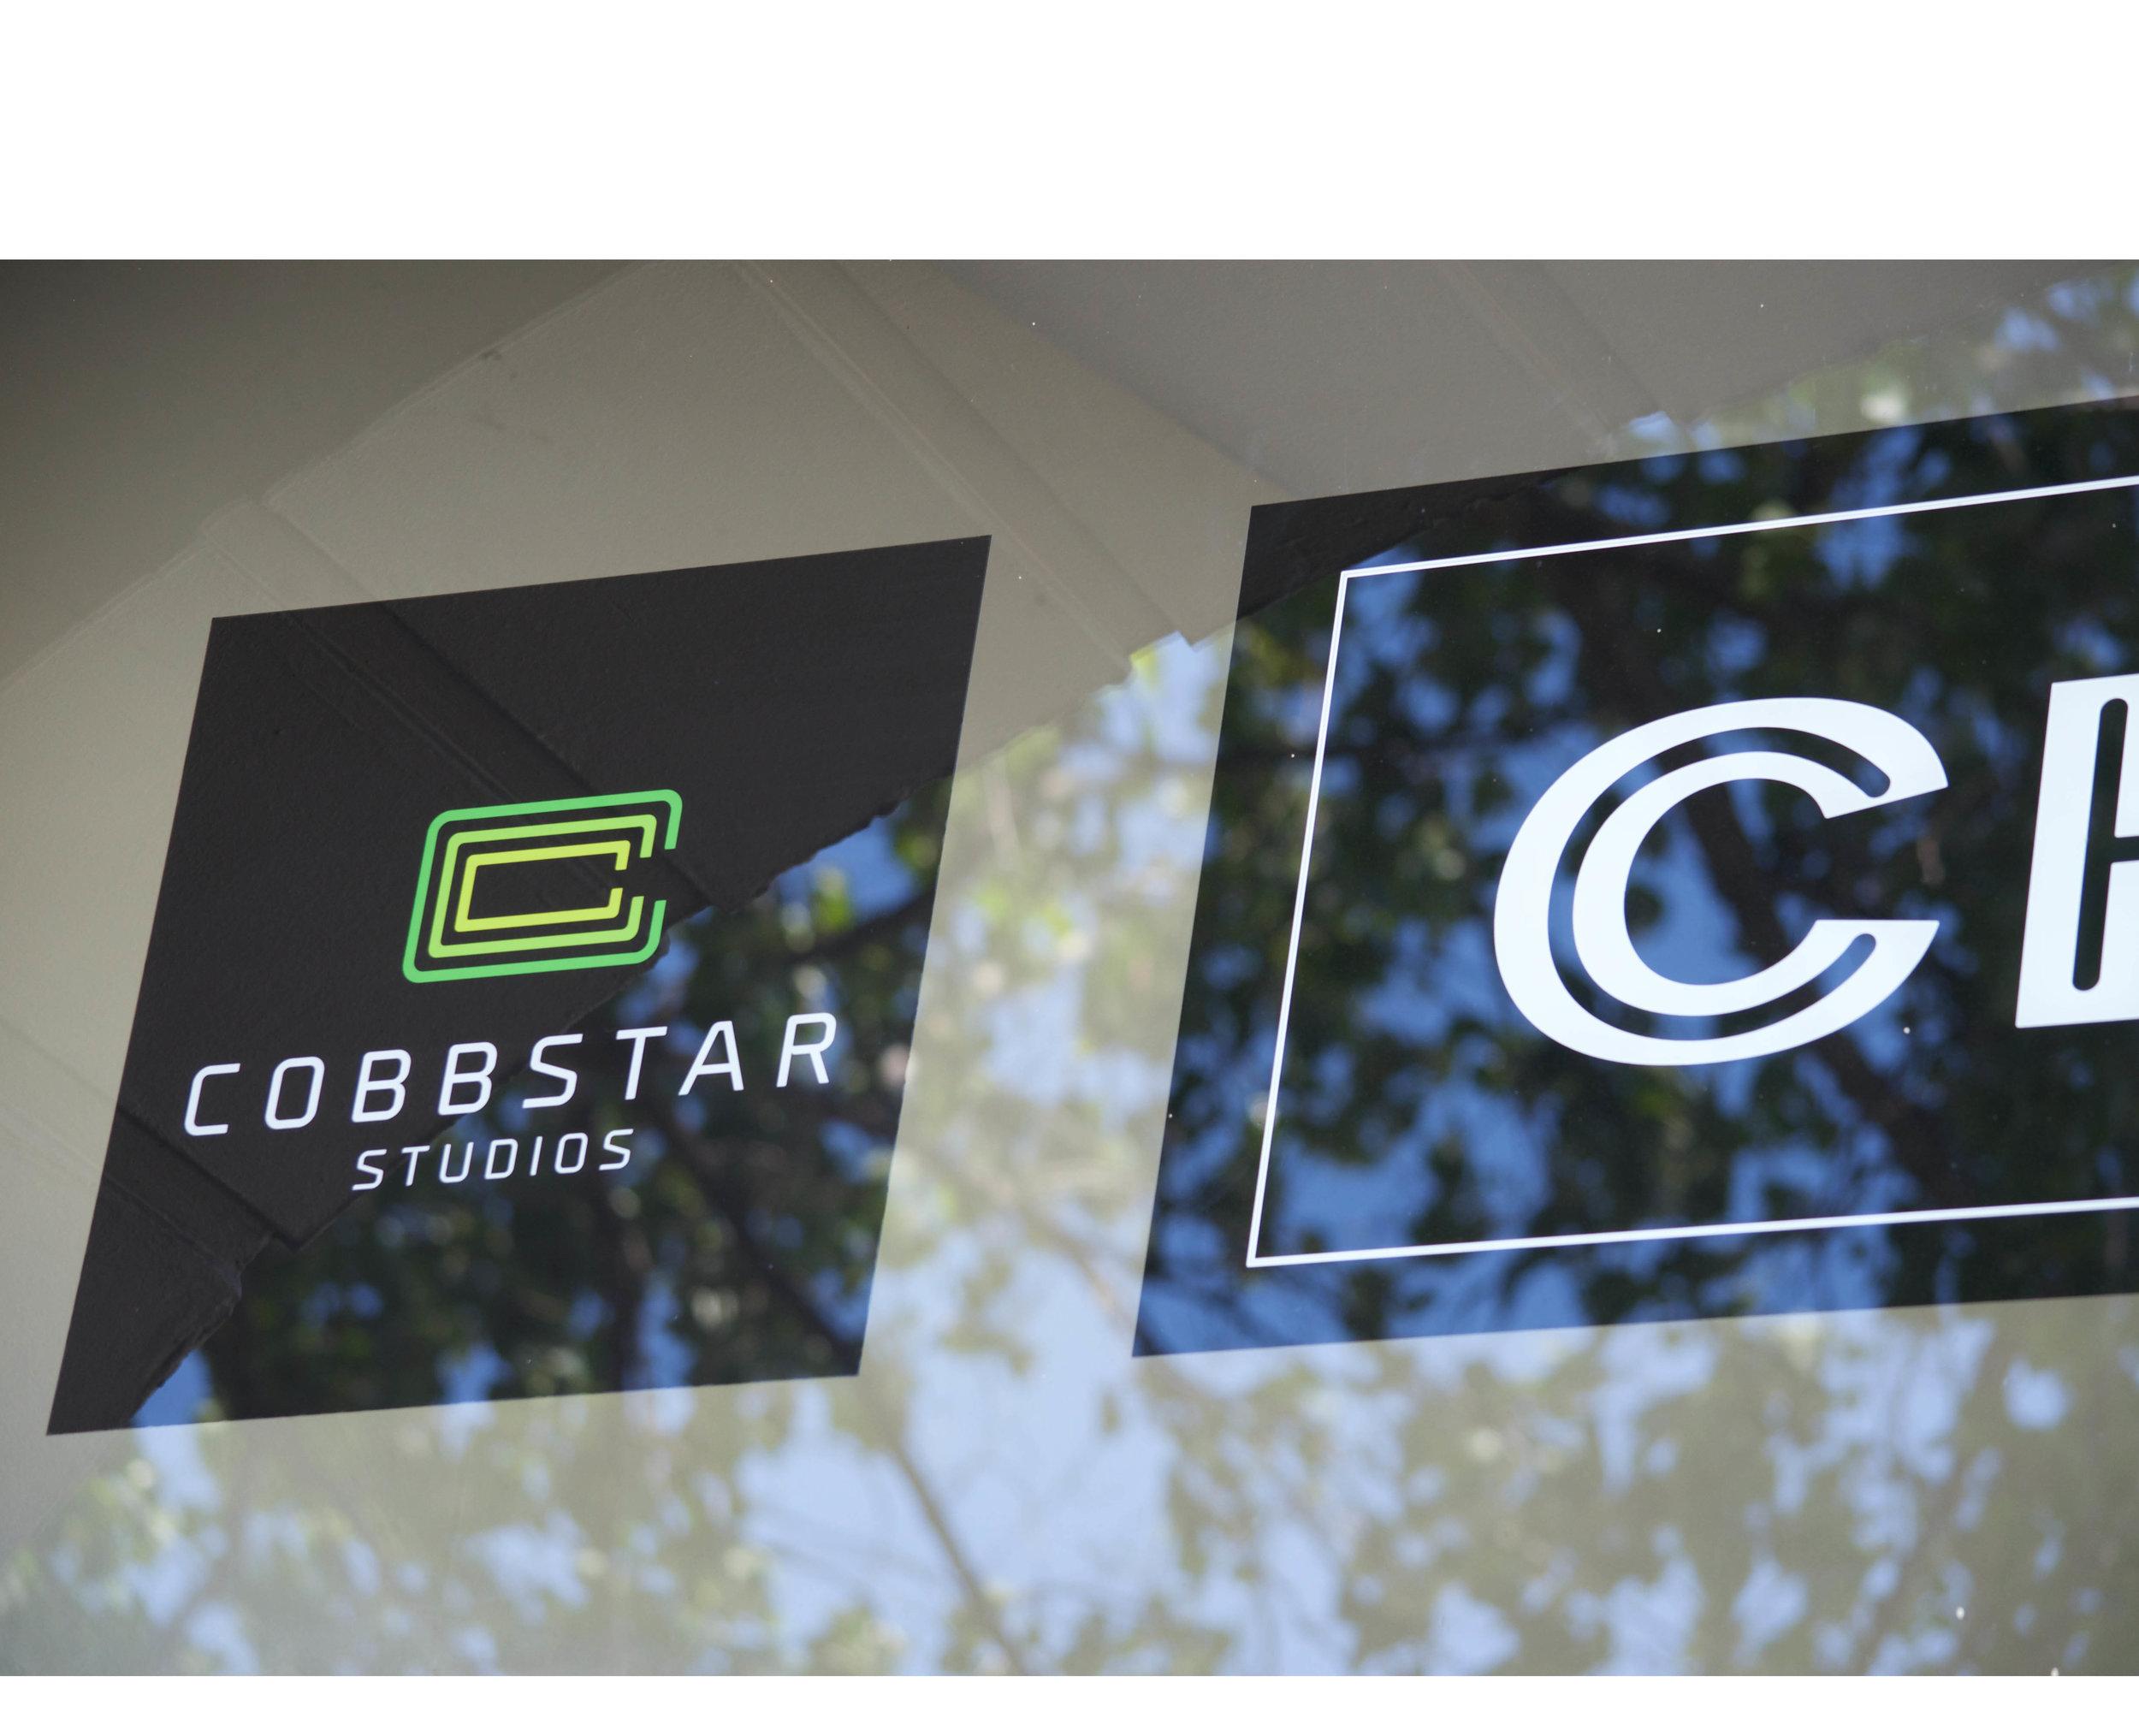 COBBSTAR_STACK_PS_COL_REV.png